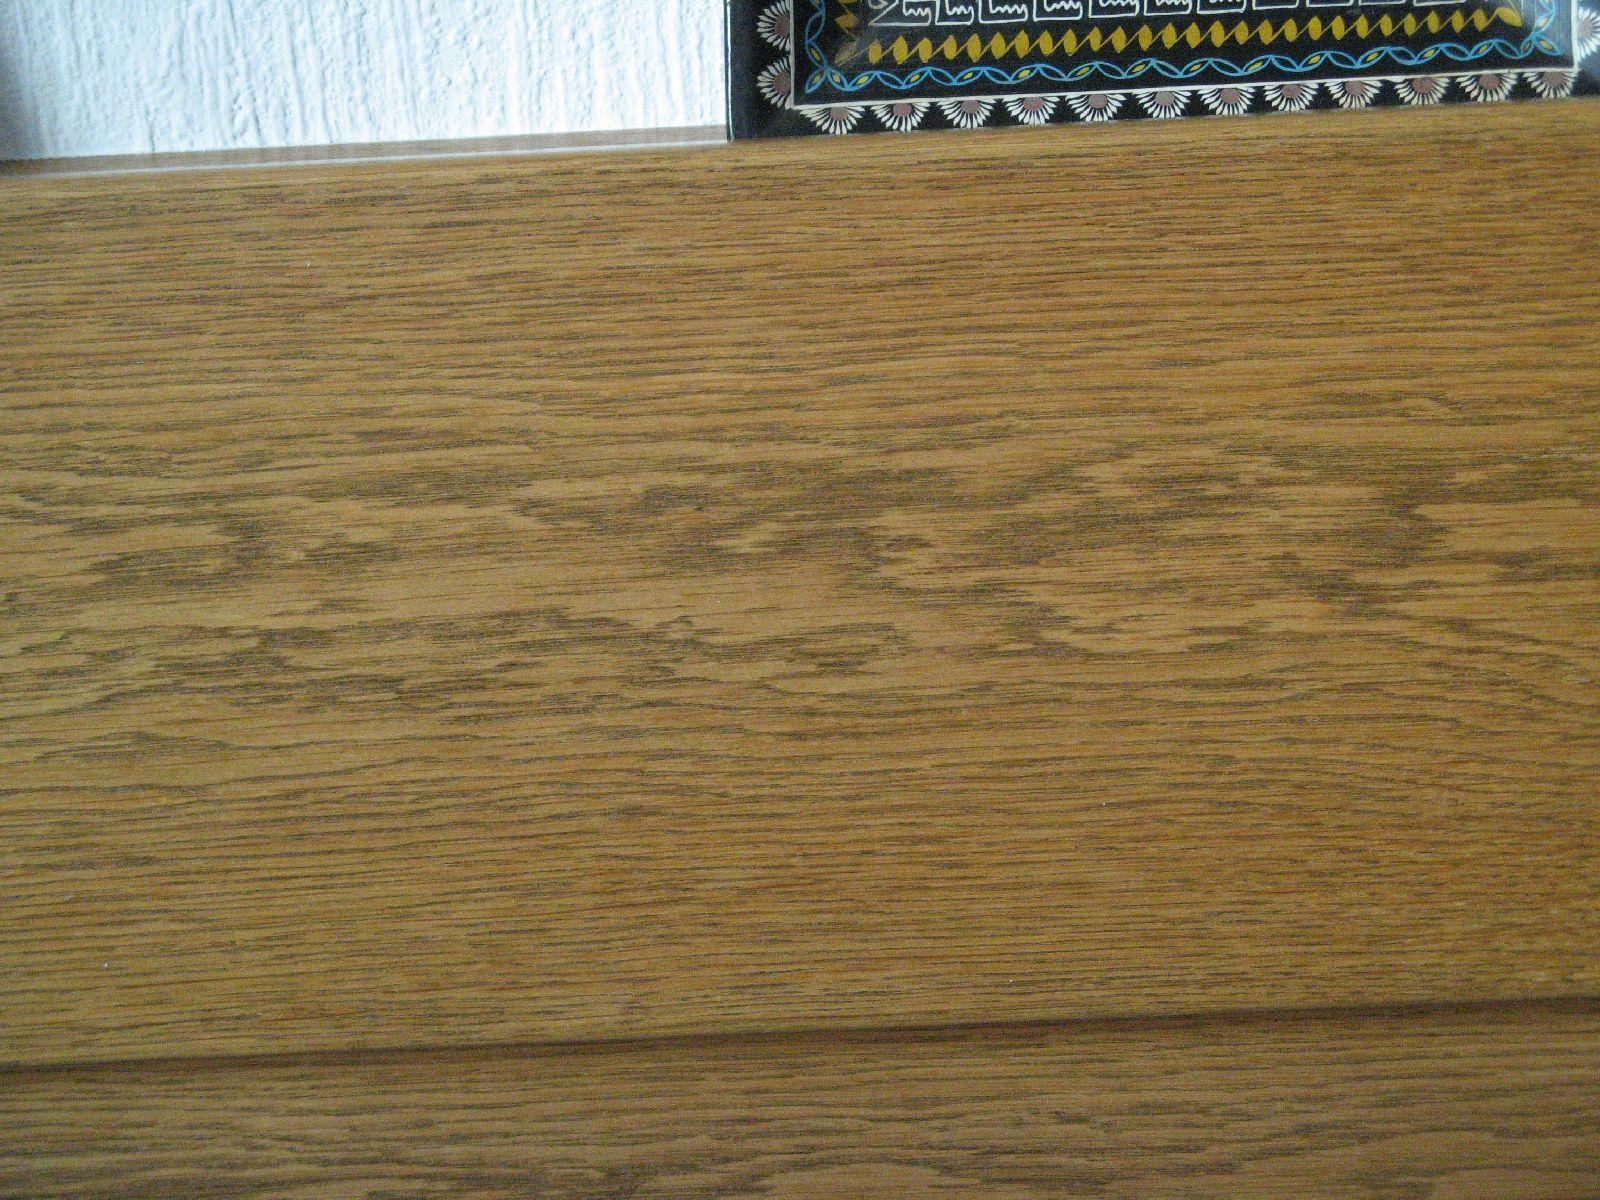 Wood_Textures_B_0305